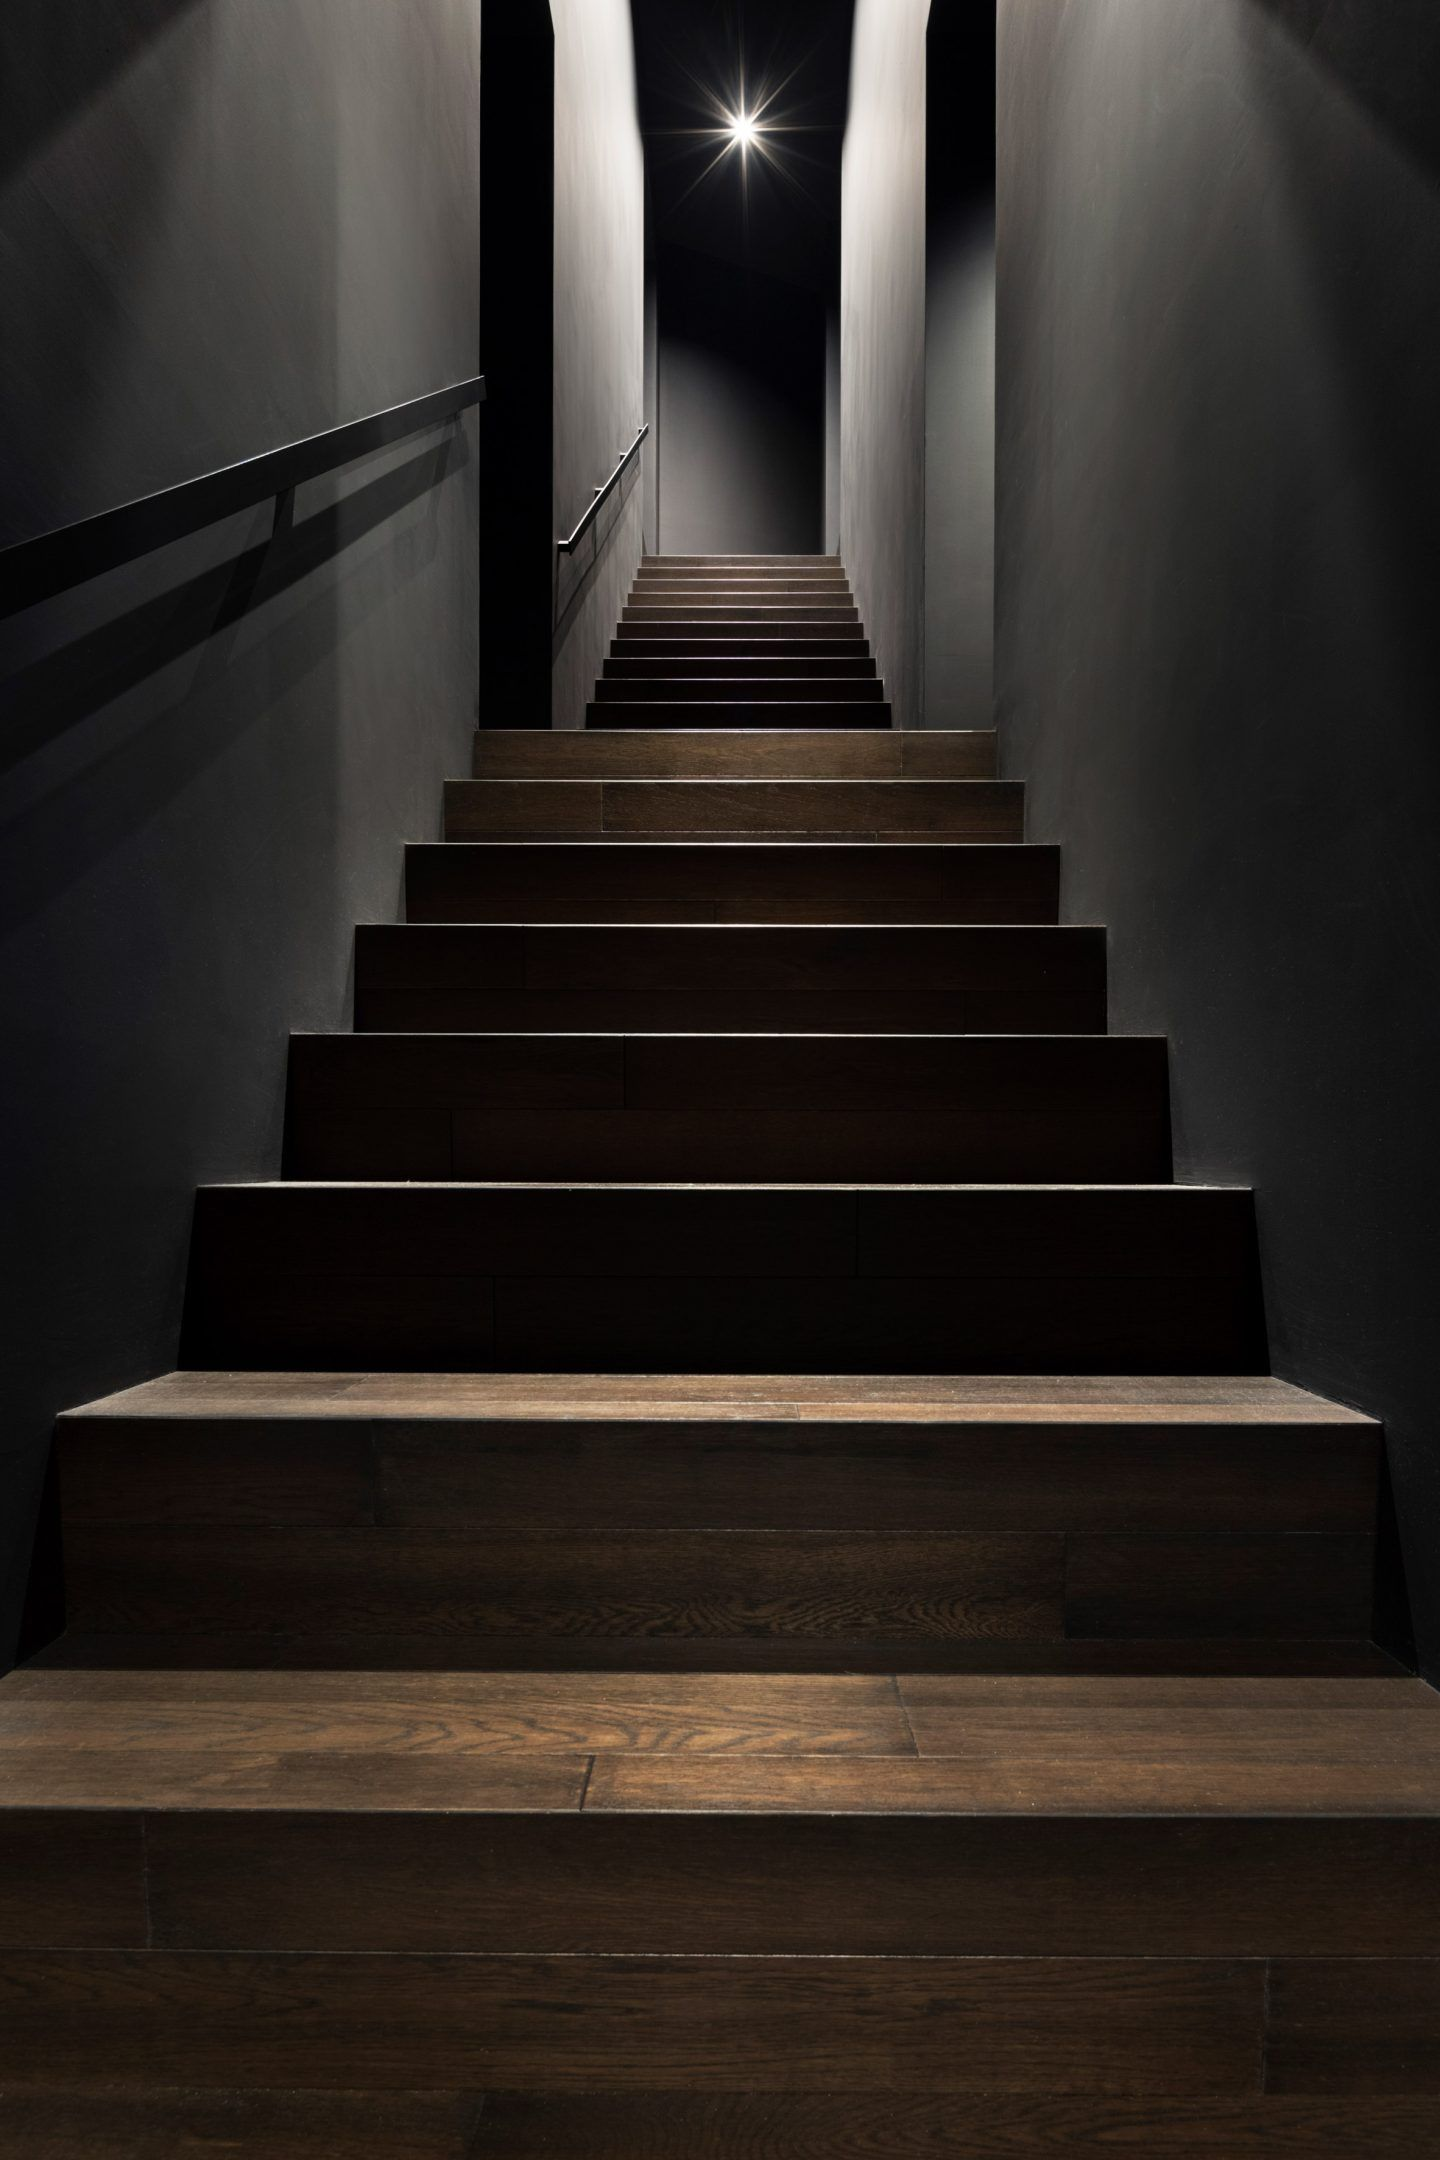 IGNANT-Architecture-Nendo-Stairway-House-06